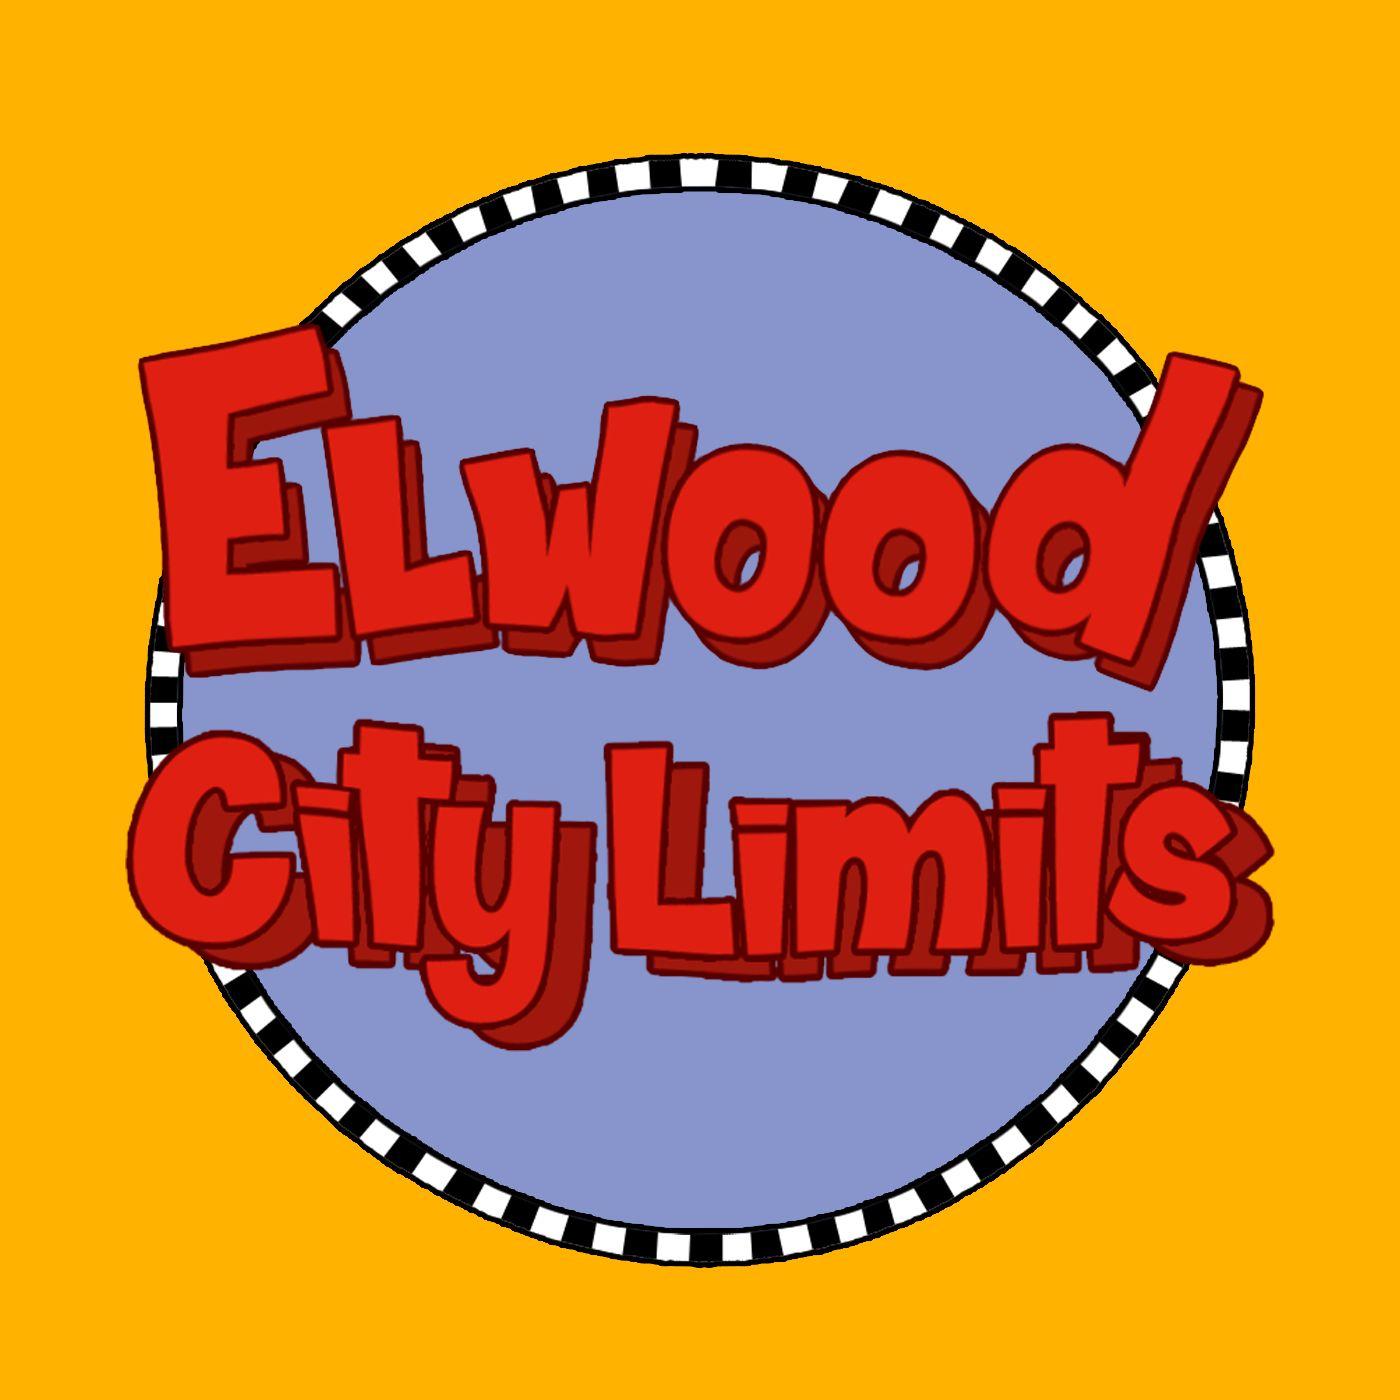 Elwood City Limits Podcast show art